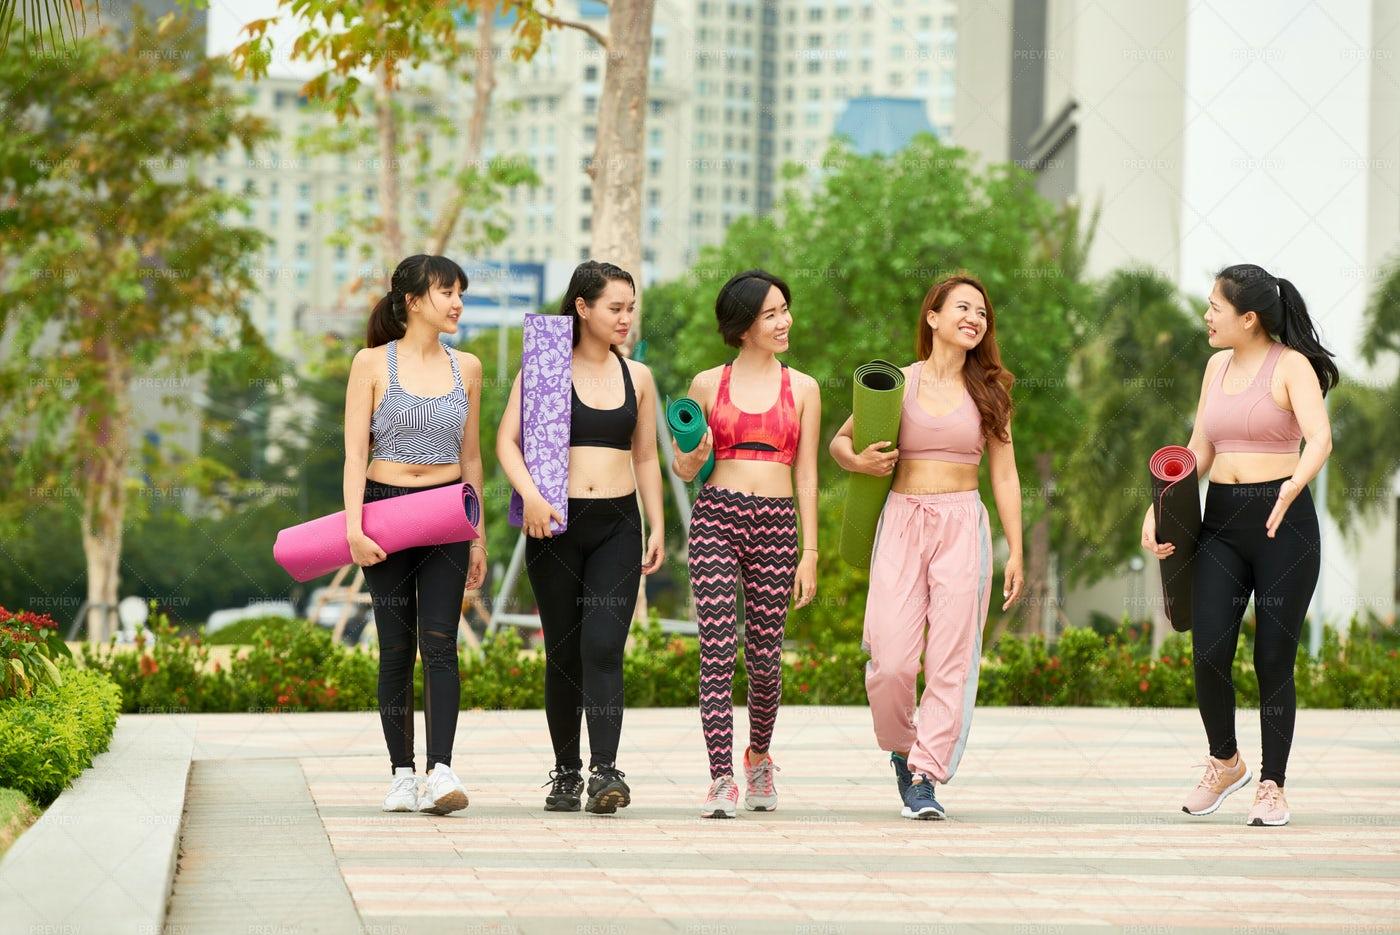 Group Of Women With Yoga Mats Outdoors: Stock Photos